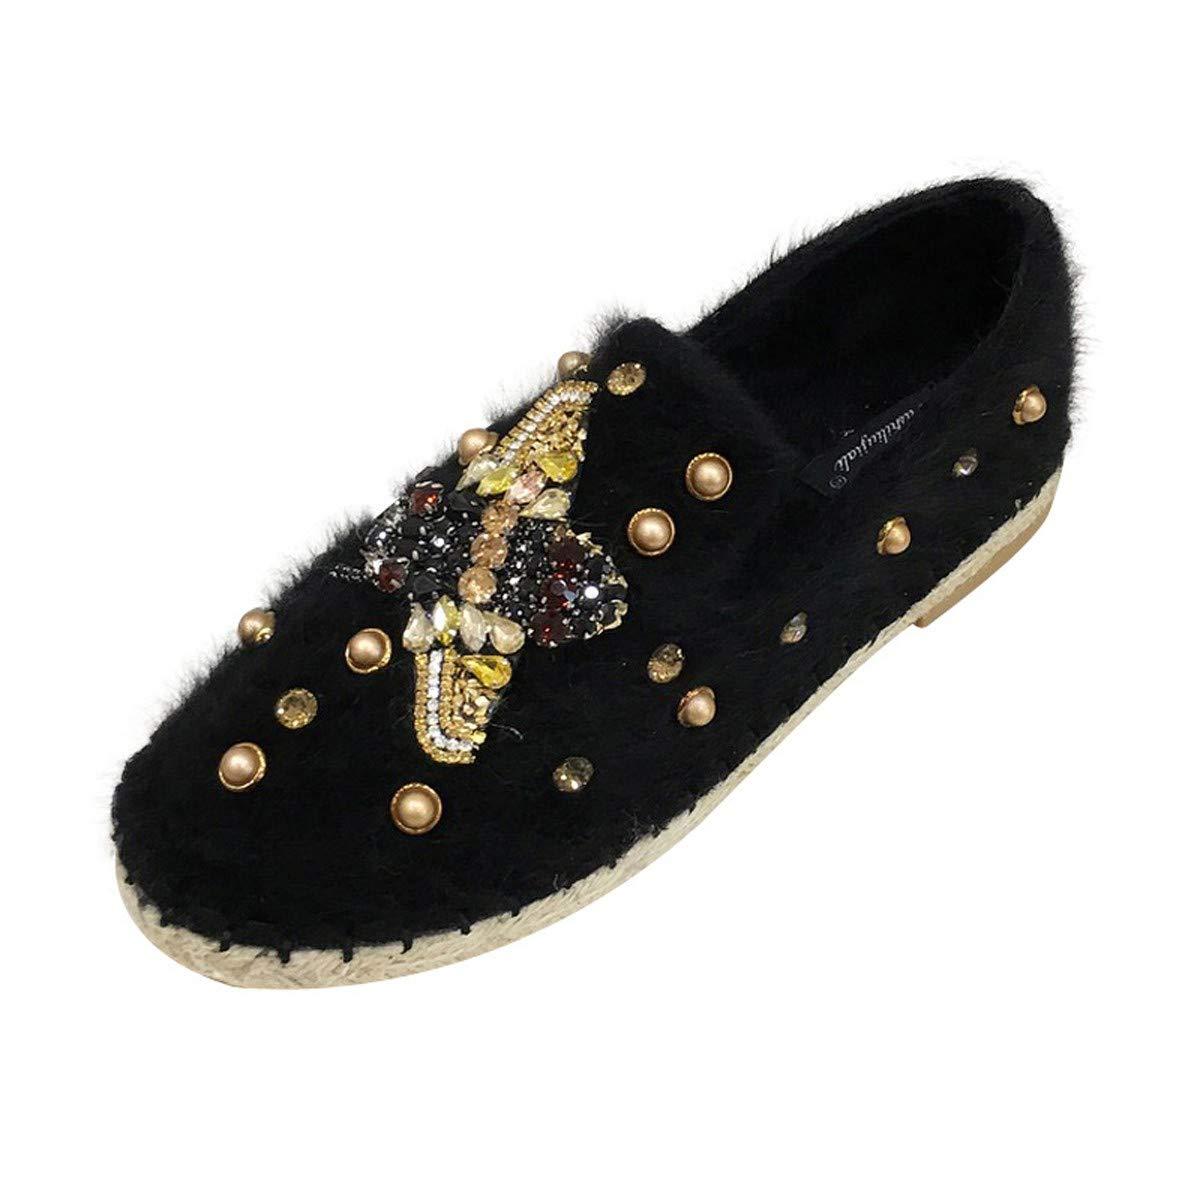 HBDLH Damenschuhe Flache Sohle Einzelne Schuhe Wasser Läuft Damenschuhe Flanell EIN Pedal Faul Schuhe